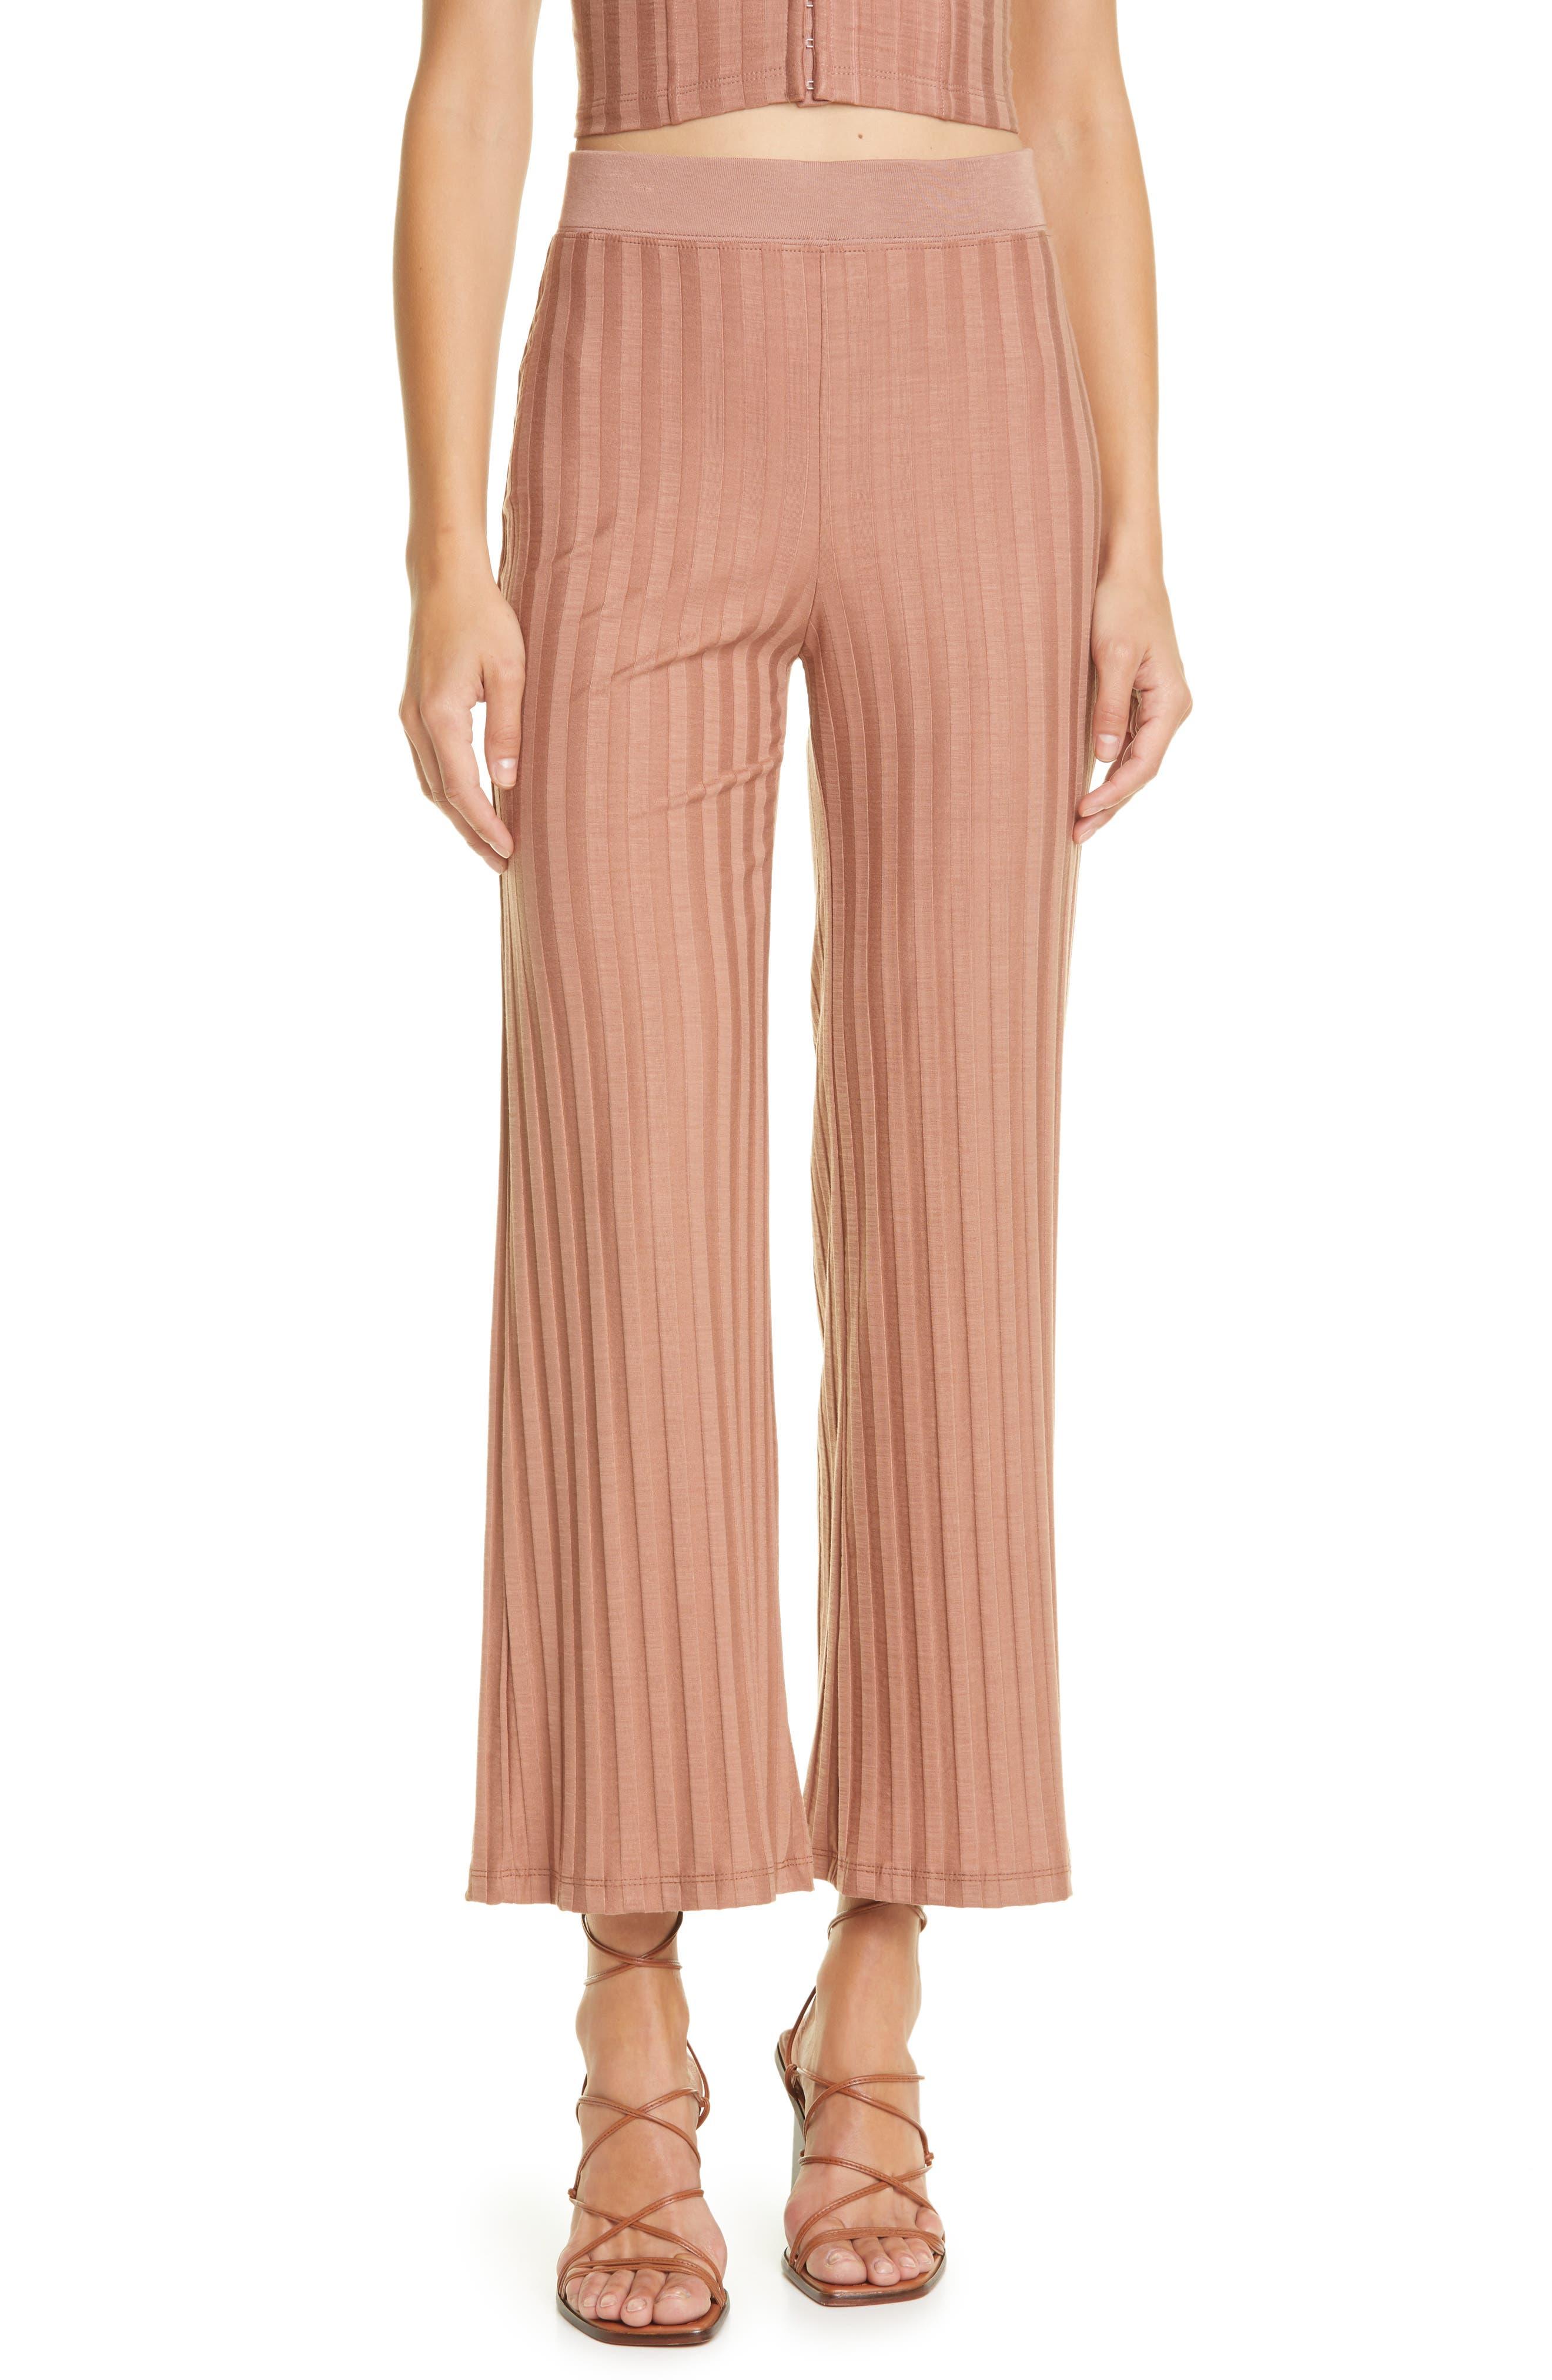 Celia Compact Rib Crop Wide Leg Pants